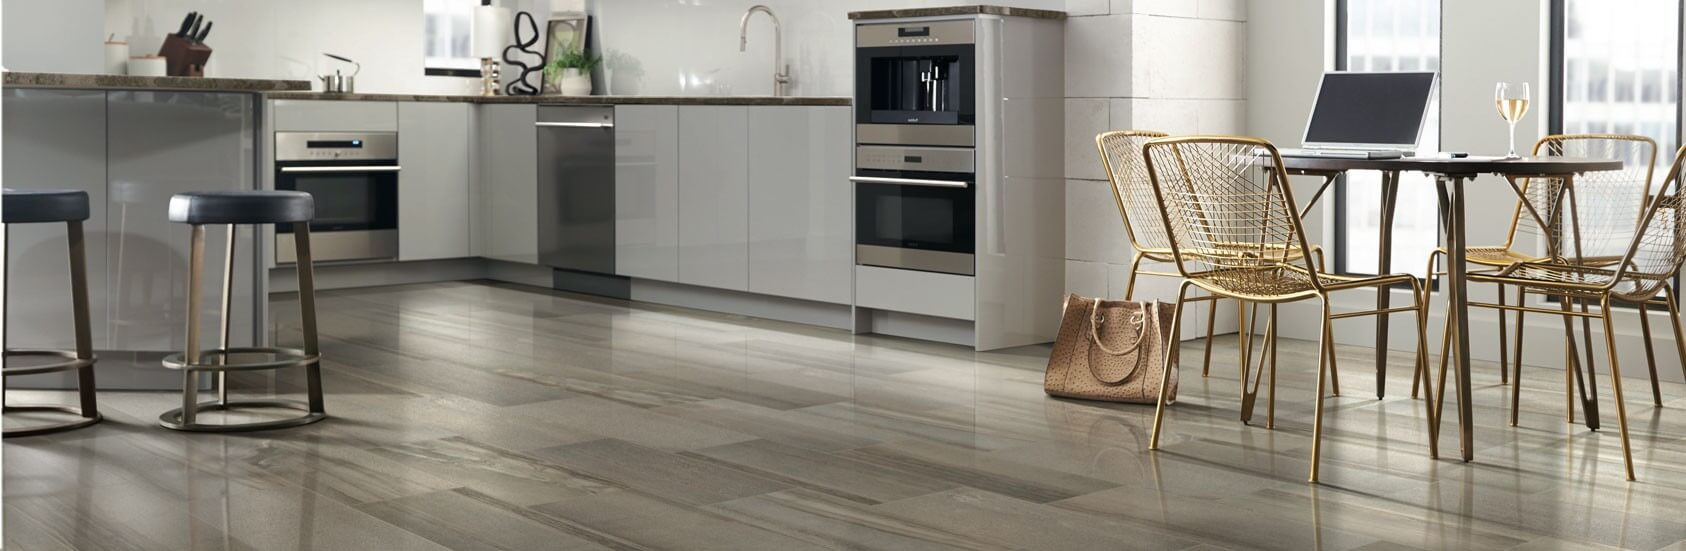 Henleys Floor Home Pros Surprize Az Flooring Store Carpet